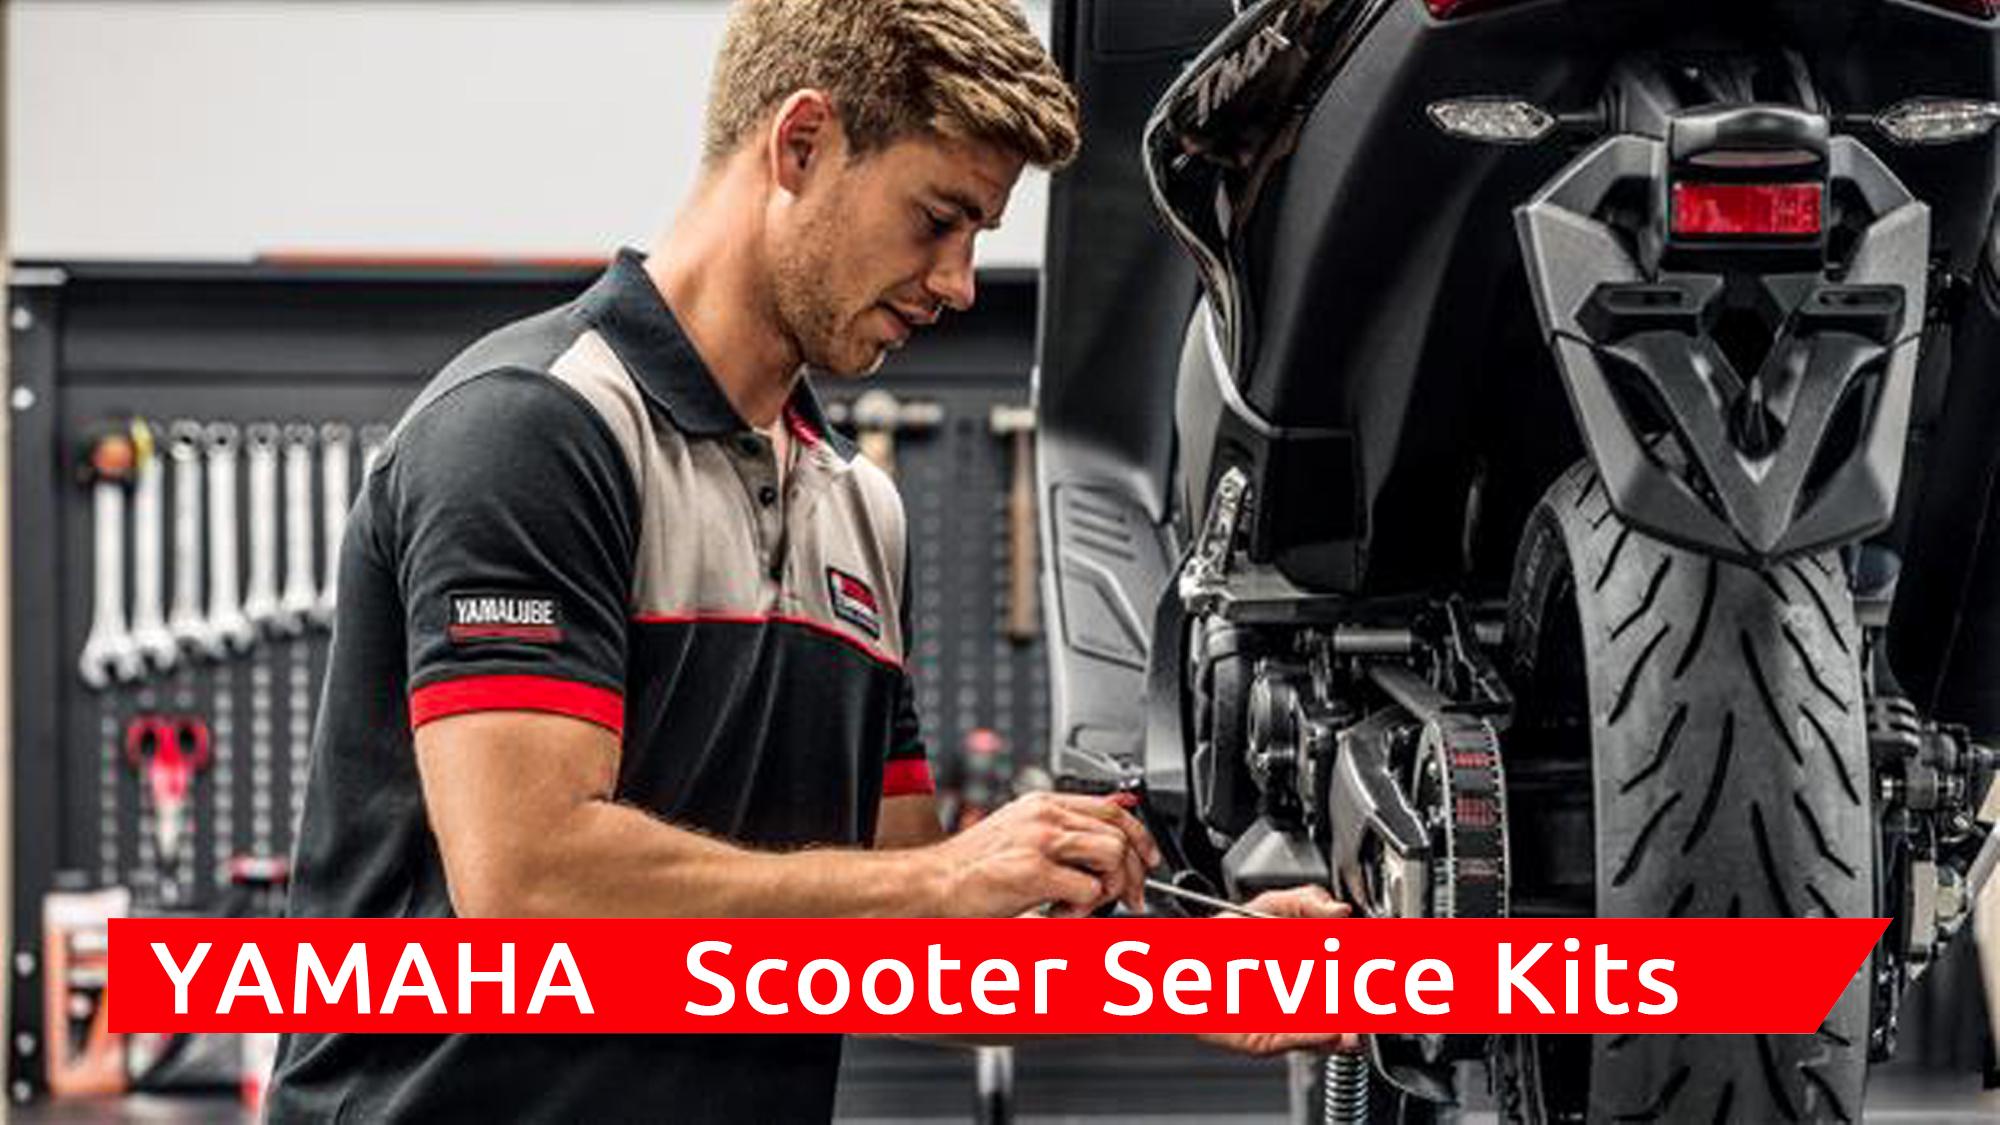 Scooter Service Kits